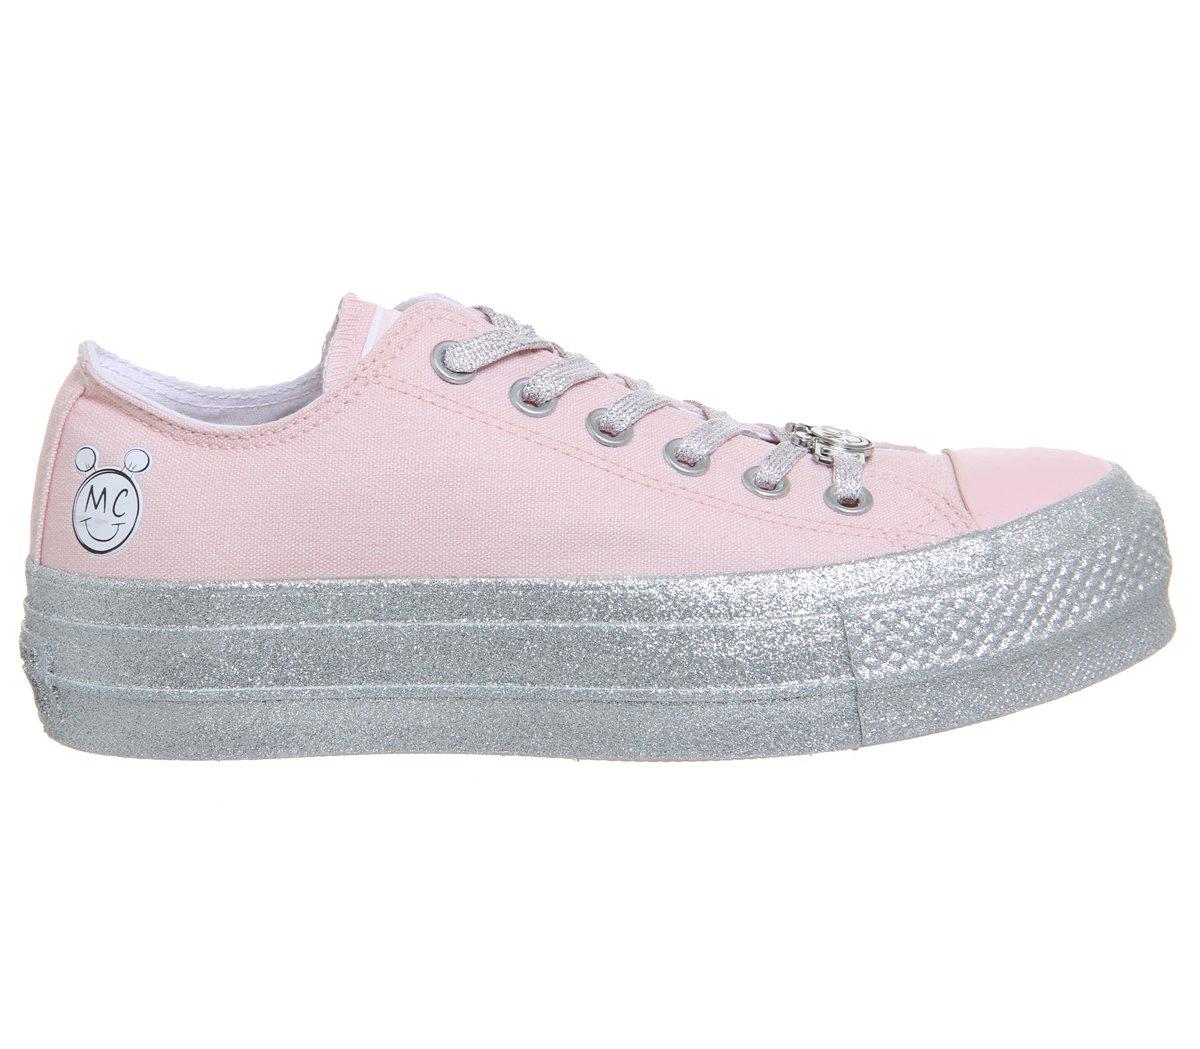 Converse Womens x Miley Cyrus Chuck Taylor All Star Lo Sneaker B07DHZ55J1 Mens 6.5/Womens 8.5 Pink Dogwood White Black 9573